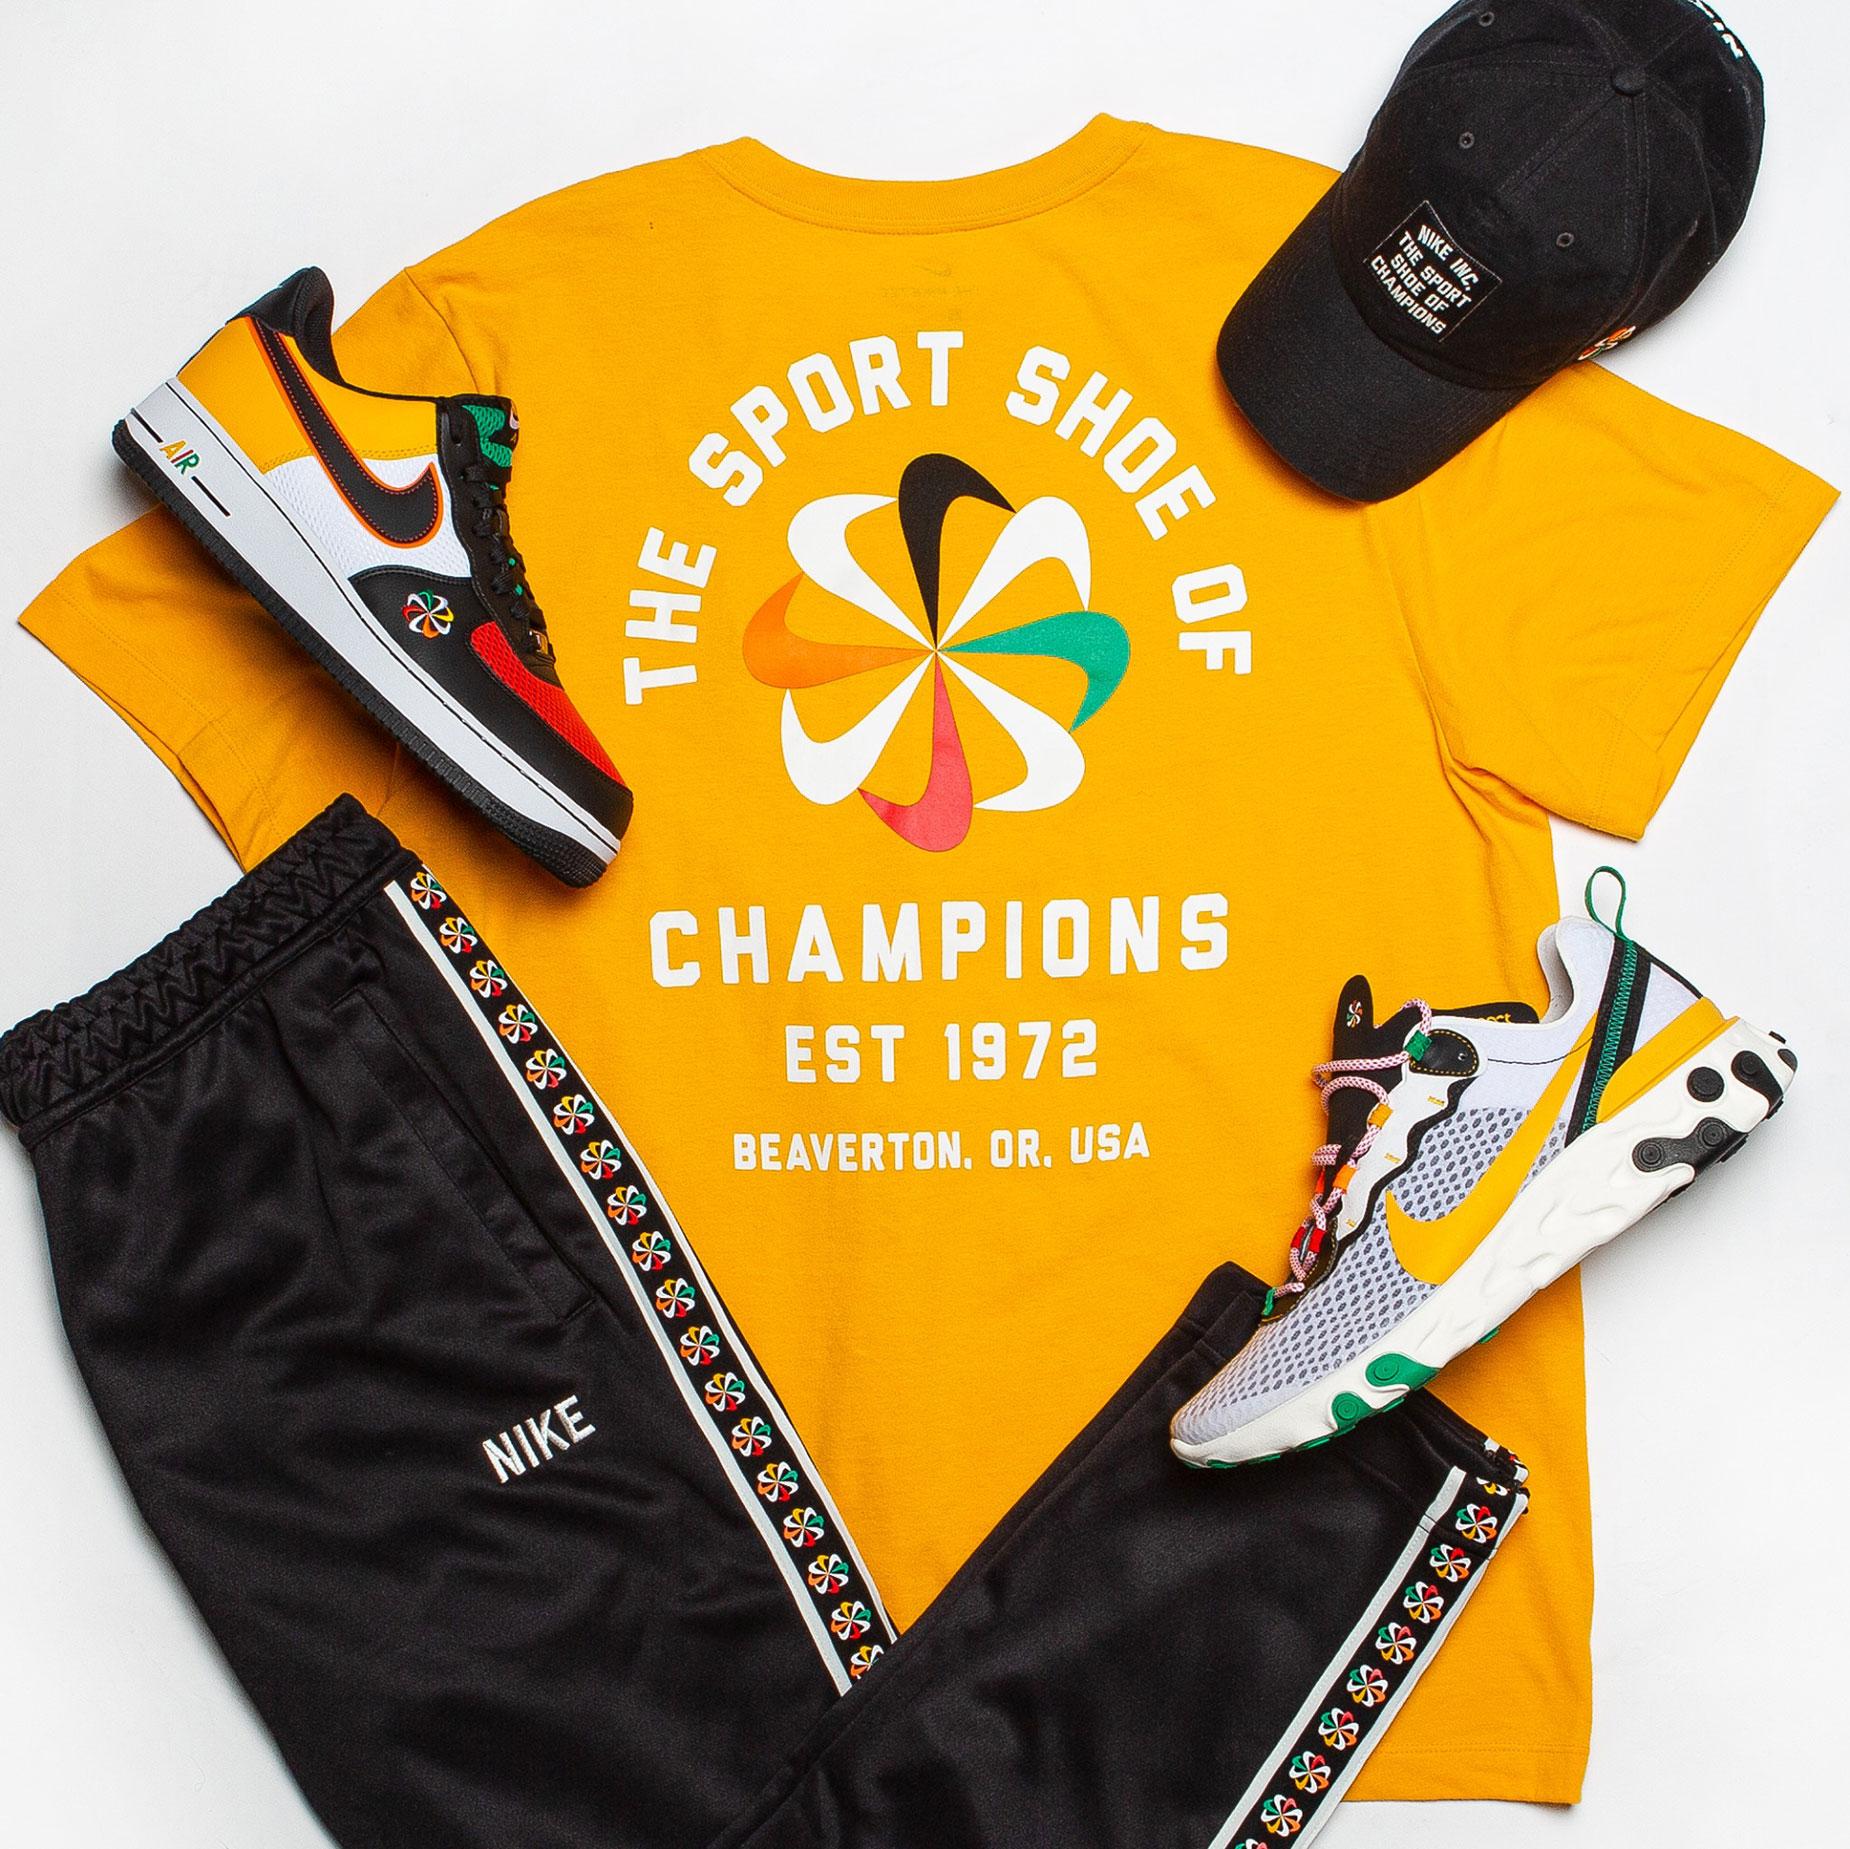 Nike Sunburst Evolution of the Swoosh Sneaker Outfits